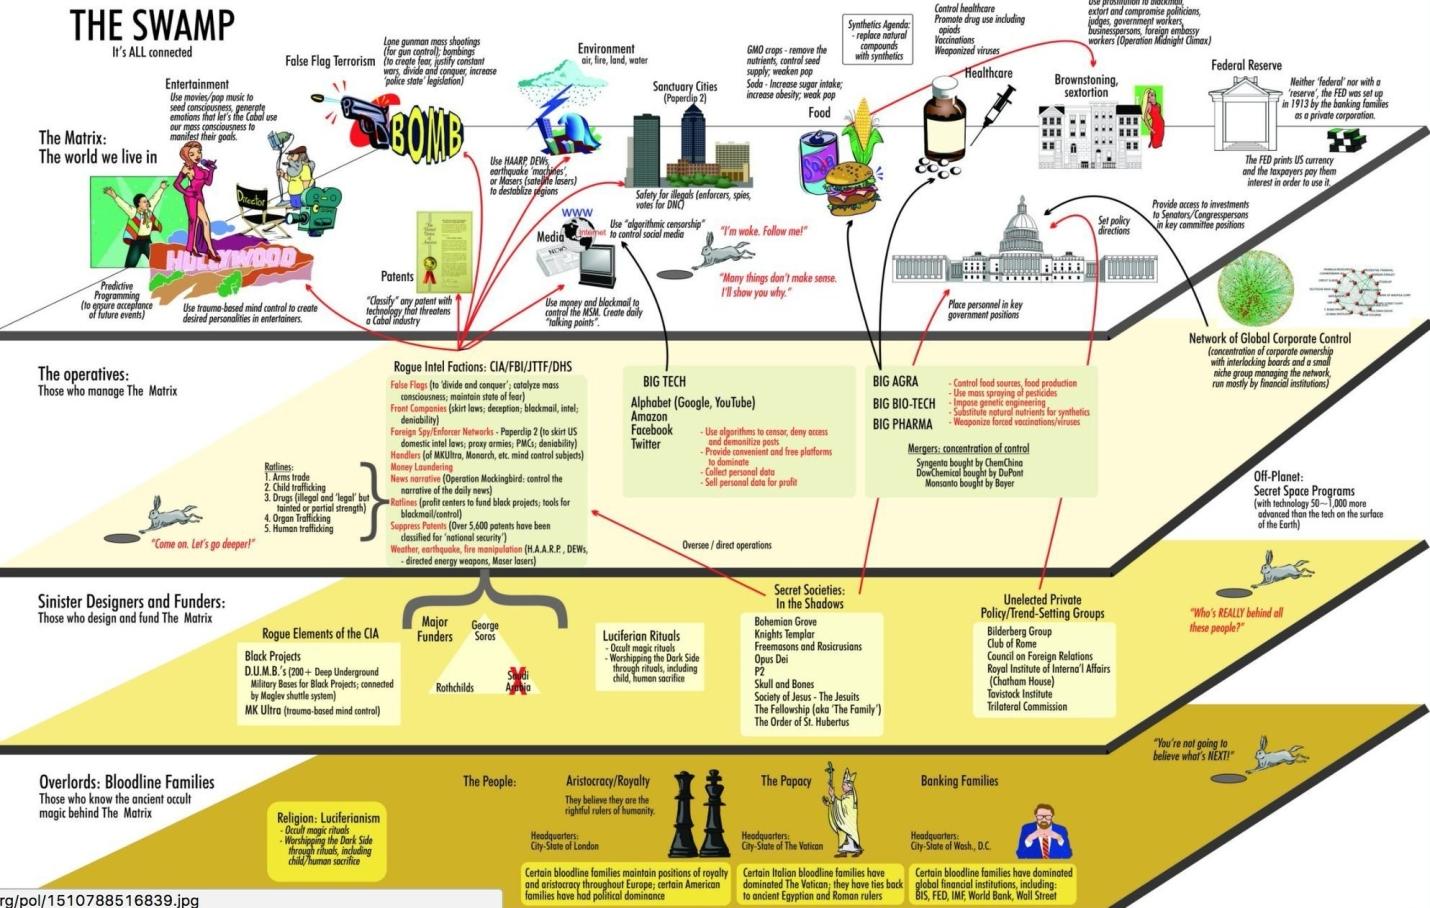 the-swamp-multi-layerd-hd-e1515570109125.jpg